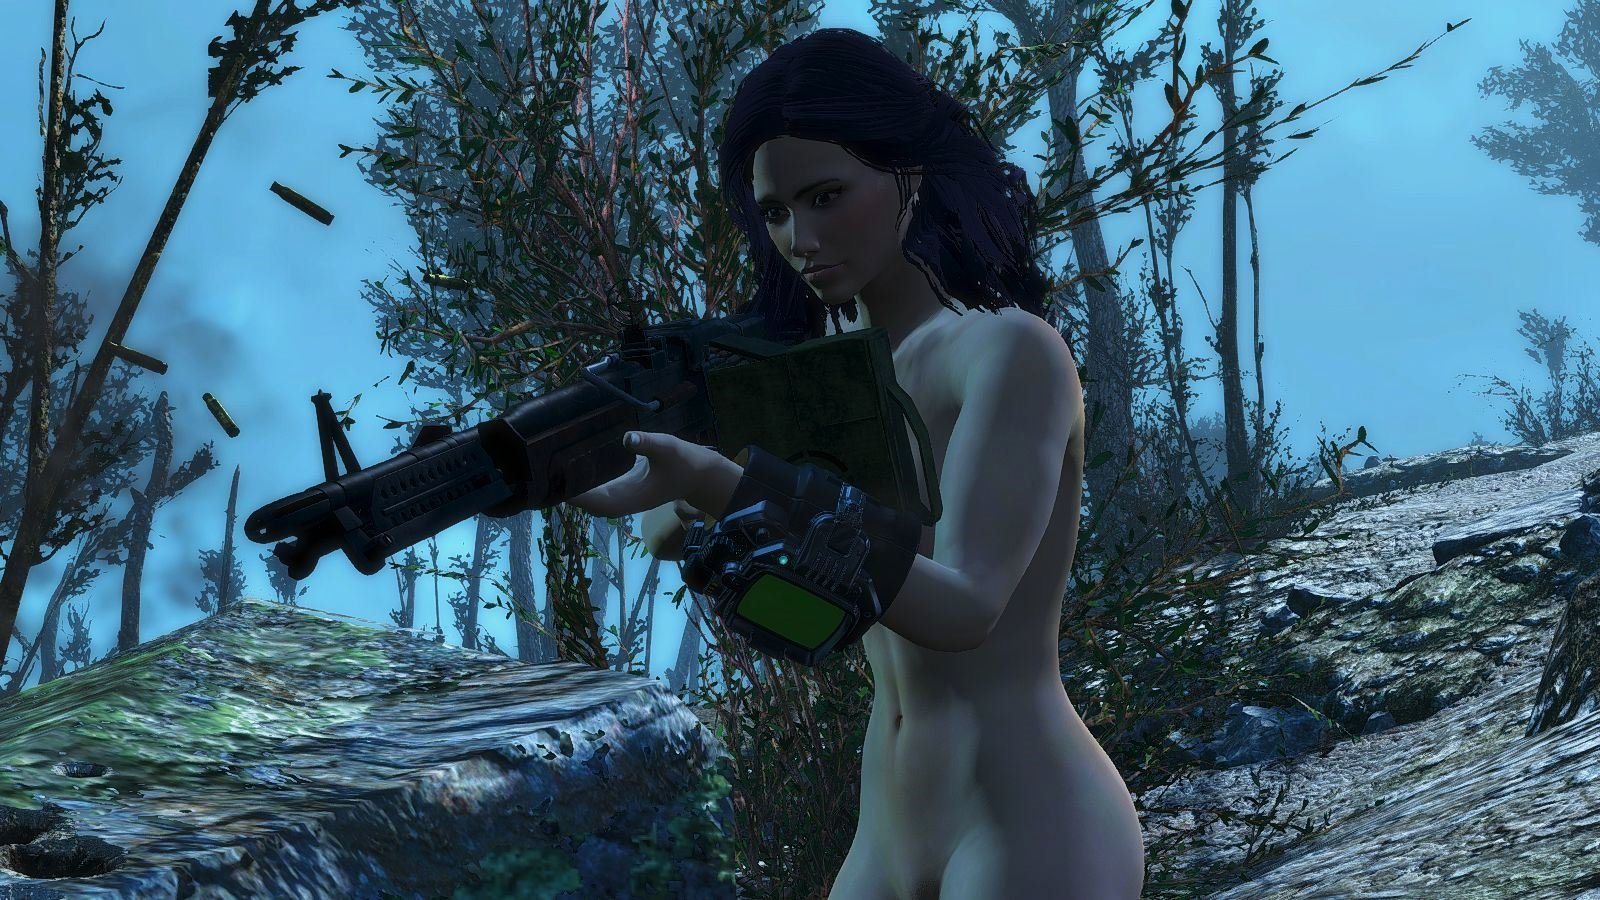 Когда мешают загарать.. Fallout-4 (сборка 6.0)